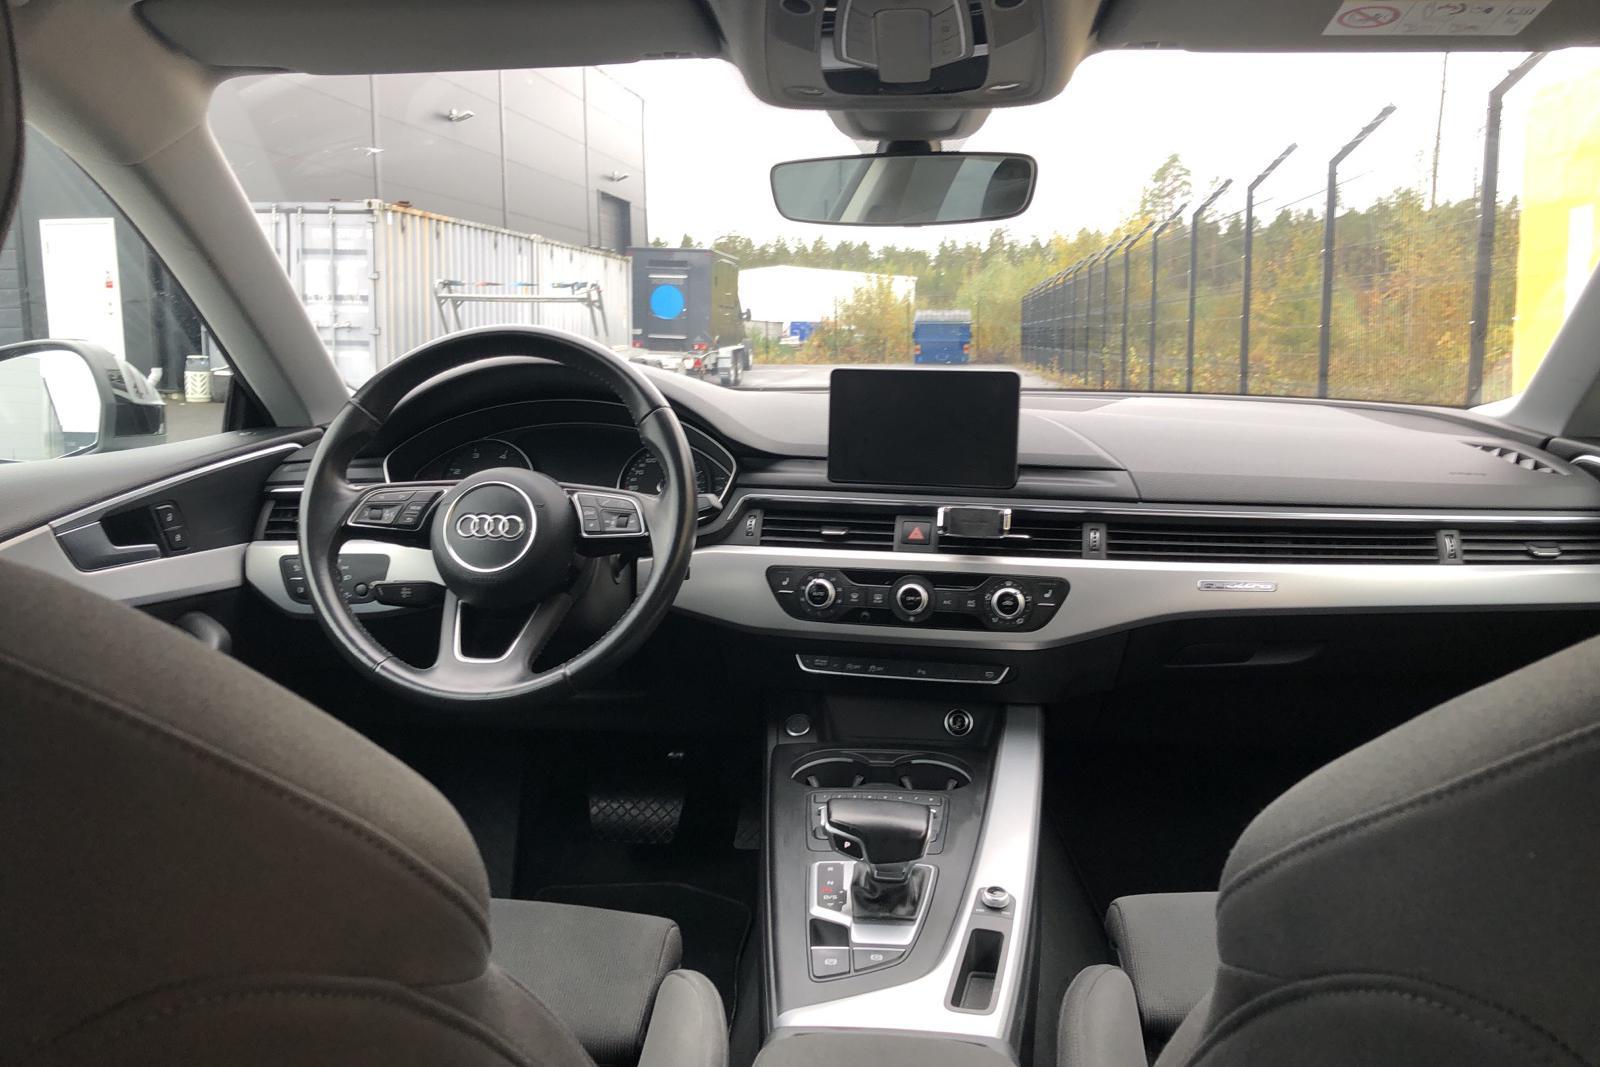 Audi A5 2.0 TDI Sportback quattro (190hk) - 71 640 km - Automatic - black - 2017